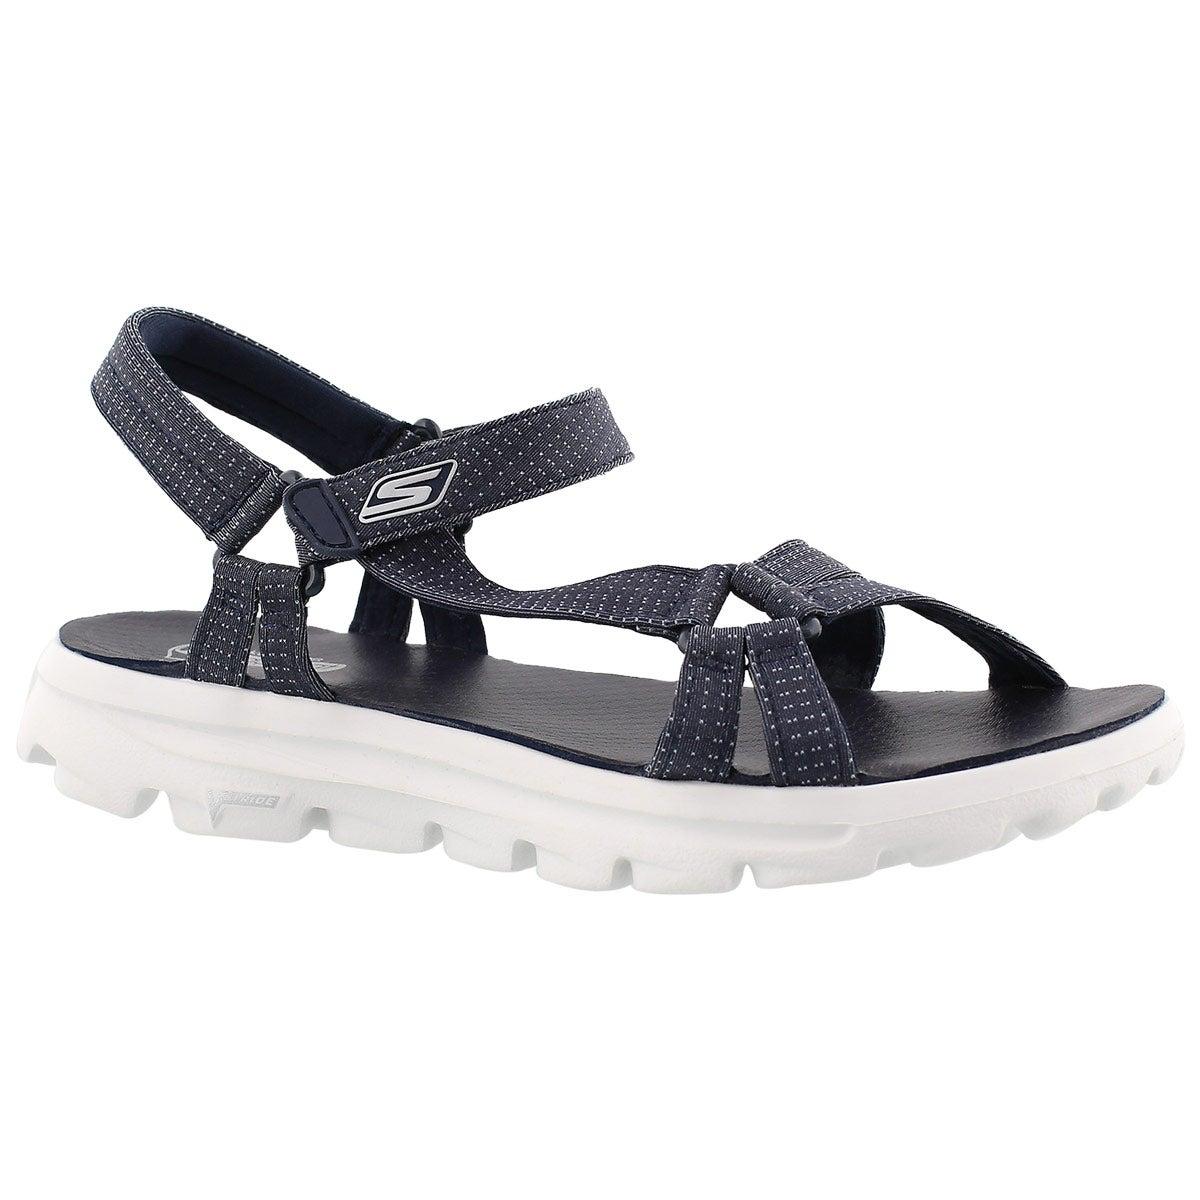 Lds River Walk navy sport sandal